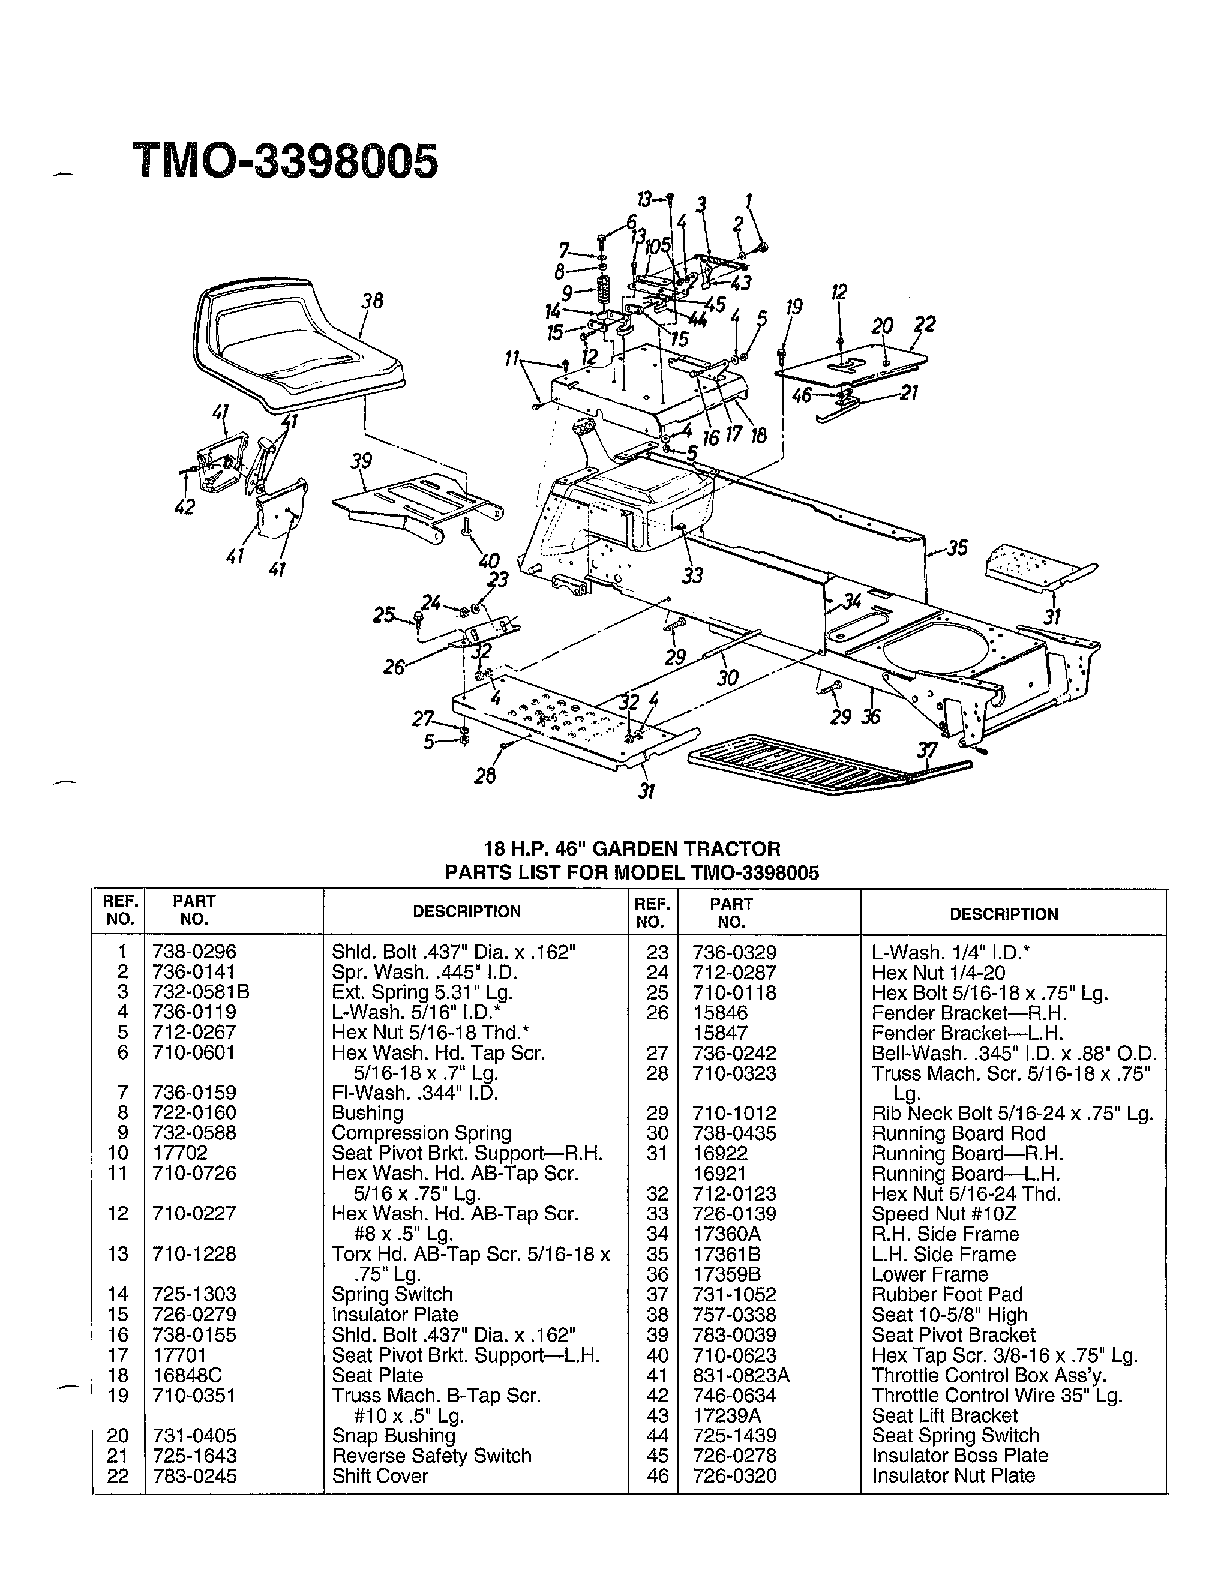 Mtd model 3398005 lawn, tractor genuine parts